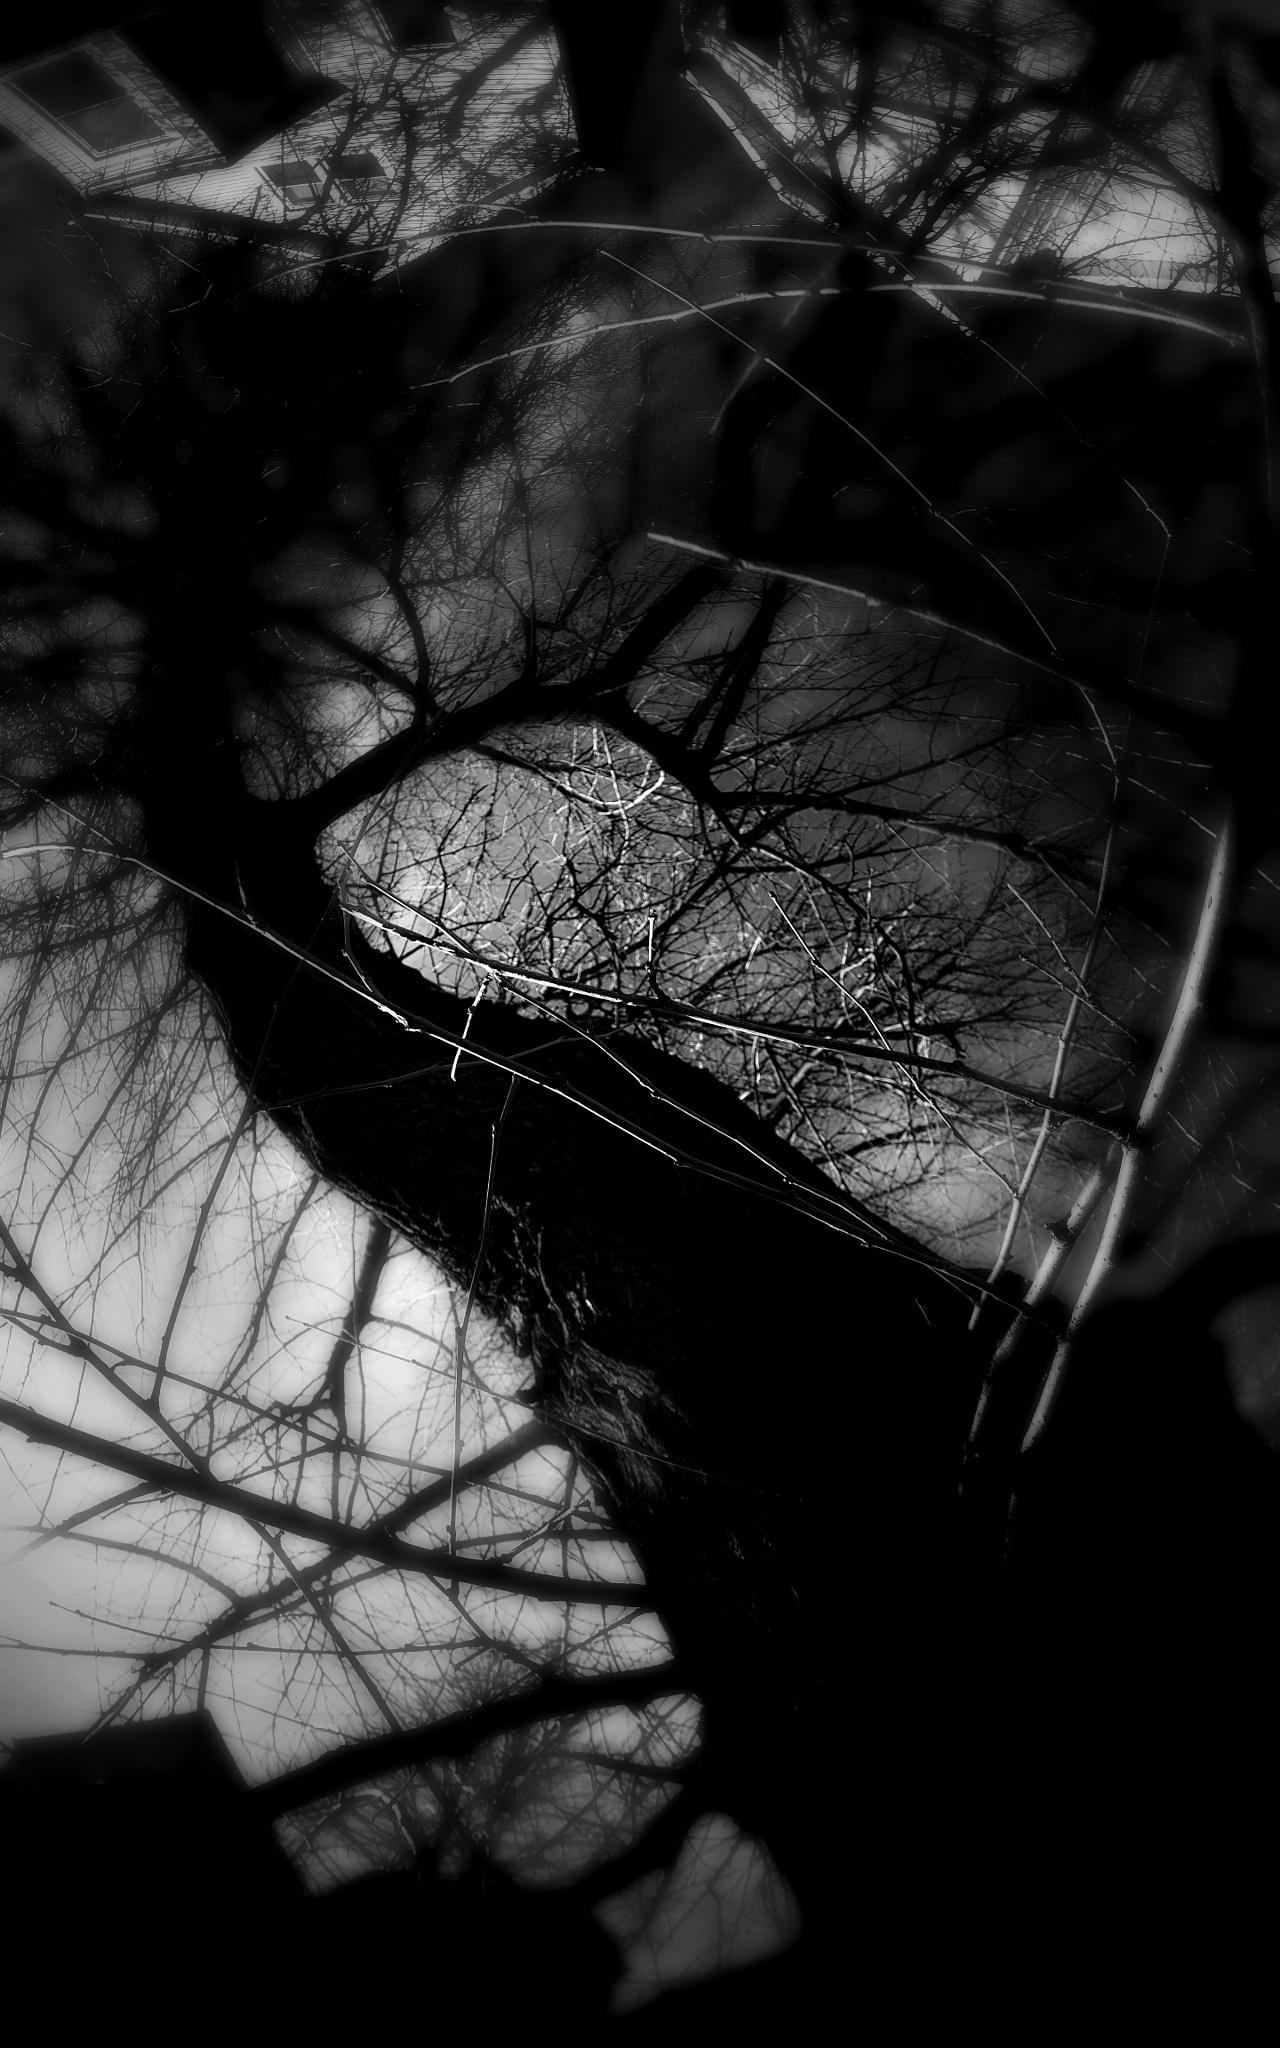 Untitled by David DeBord